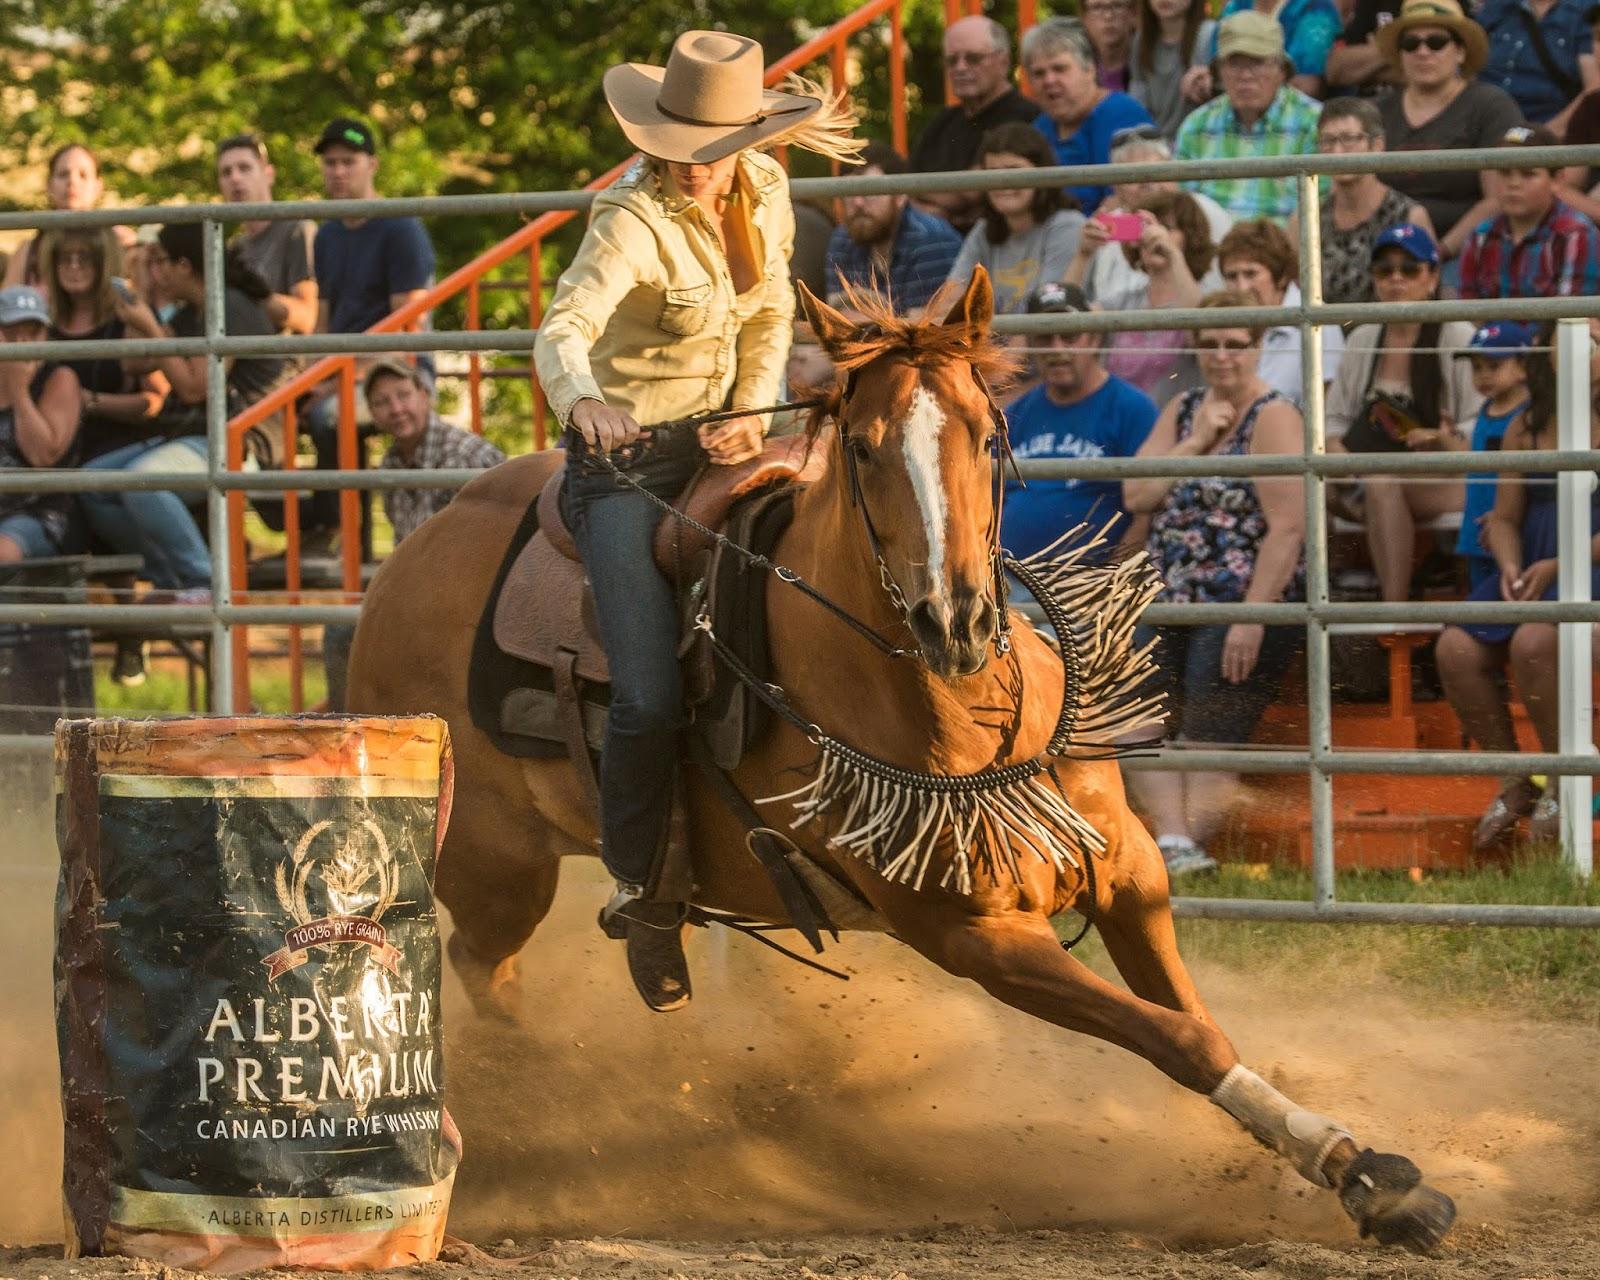 2019 Calgary Stampede Barrel Racing Results